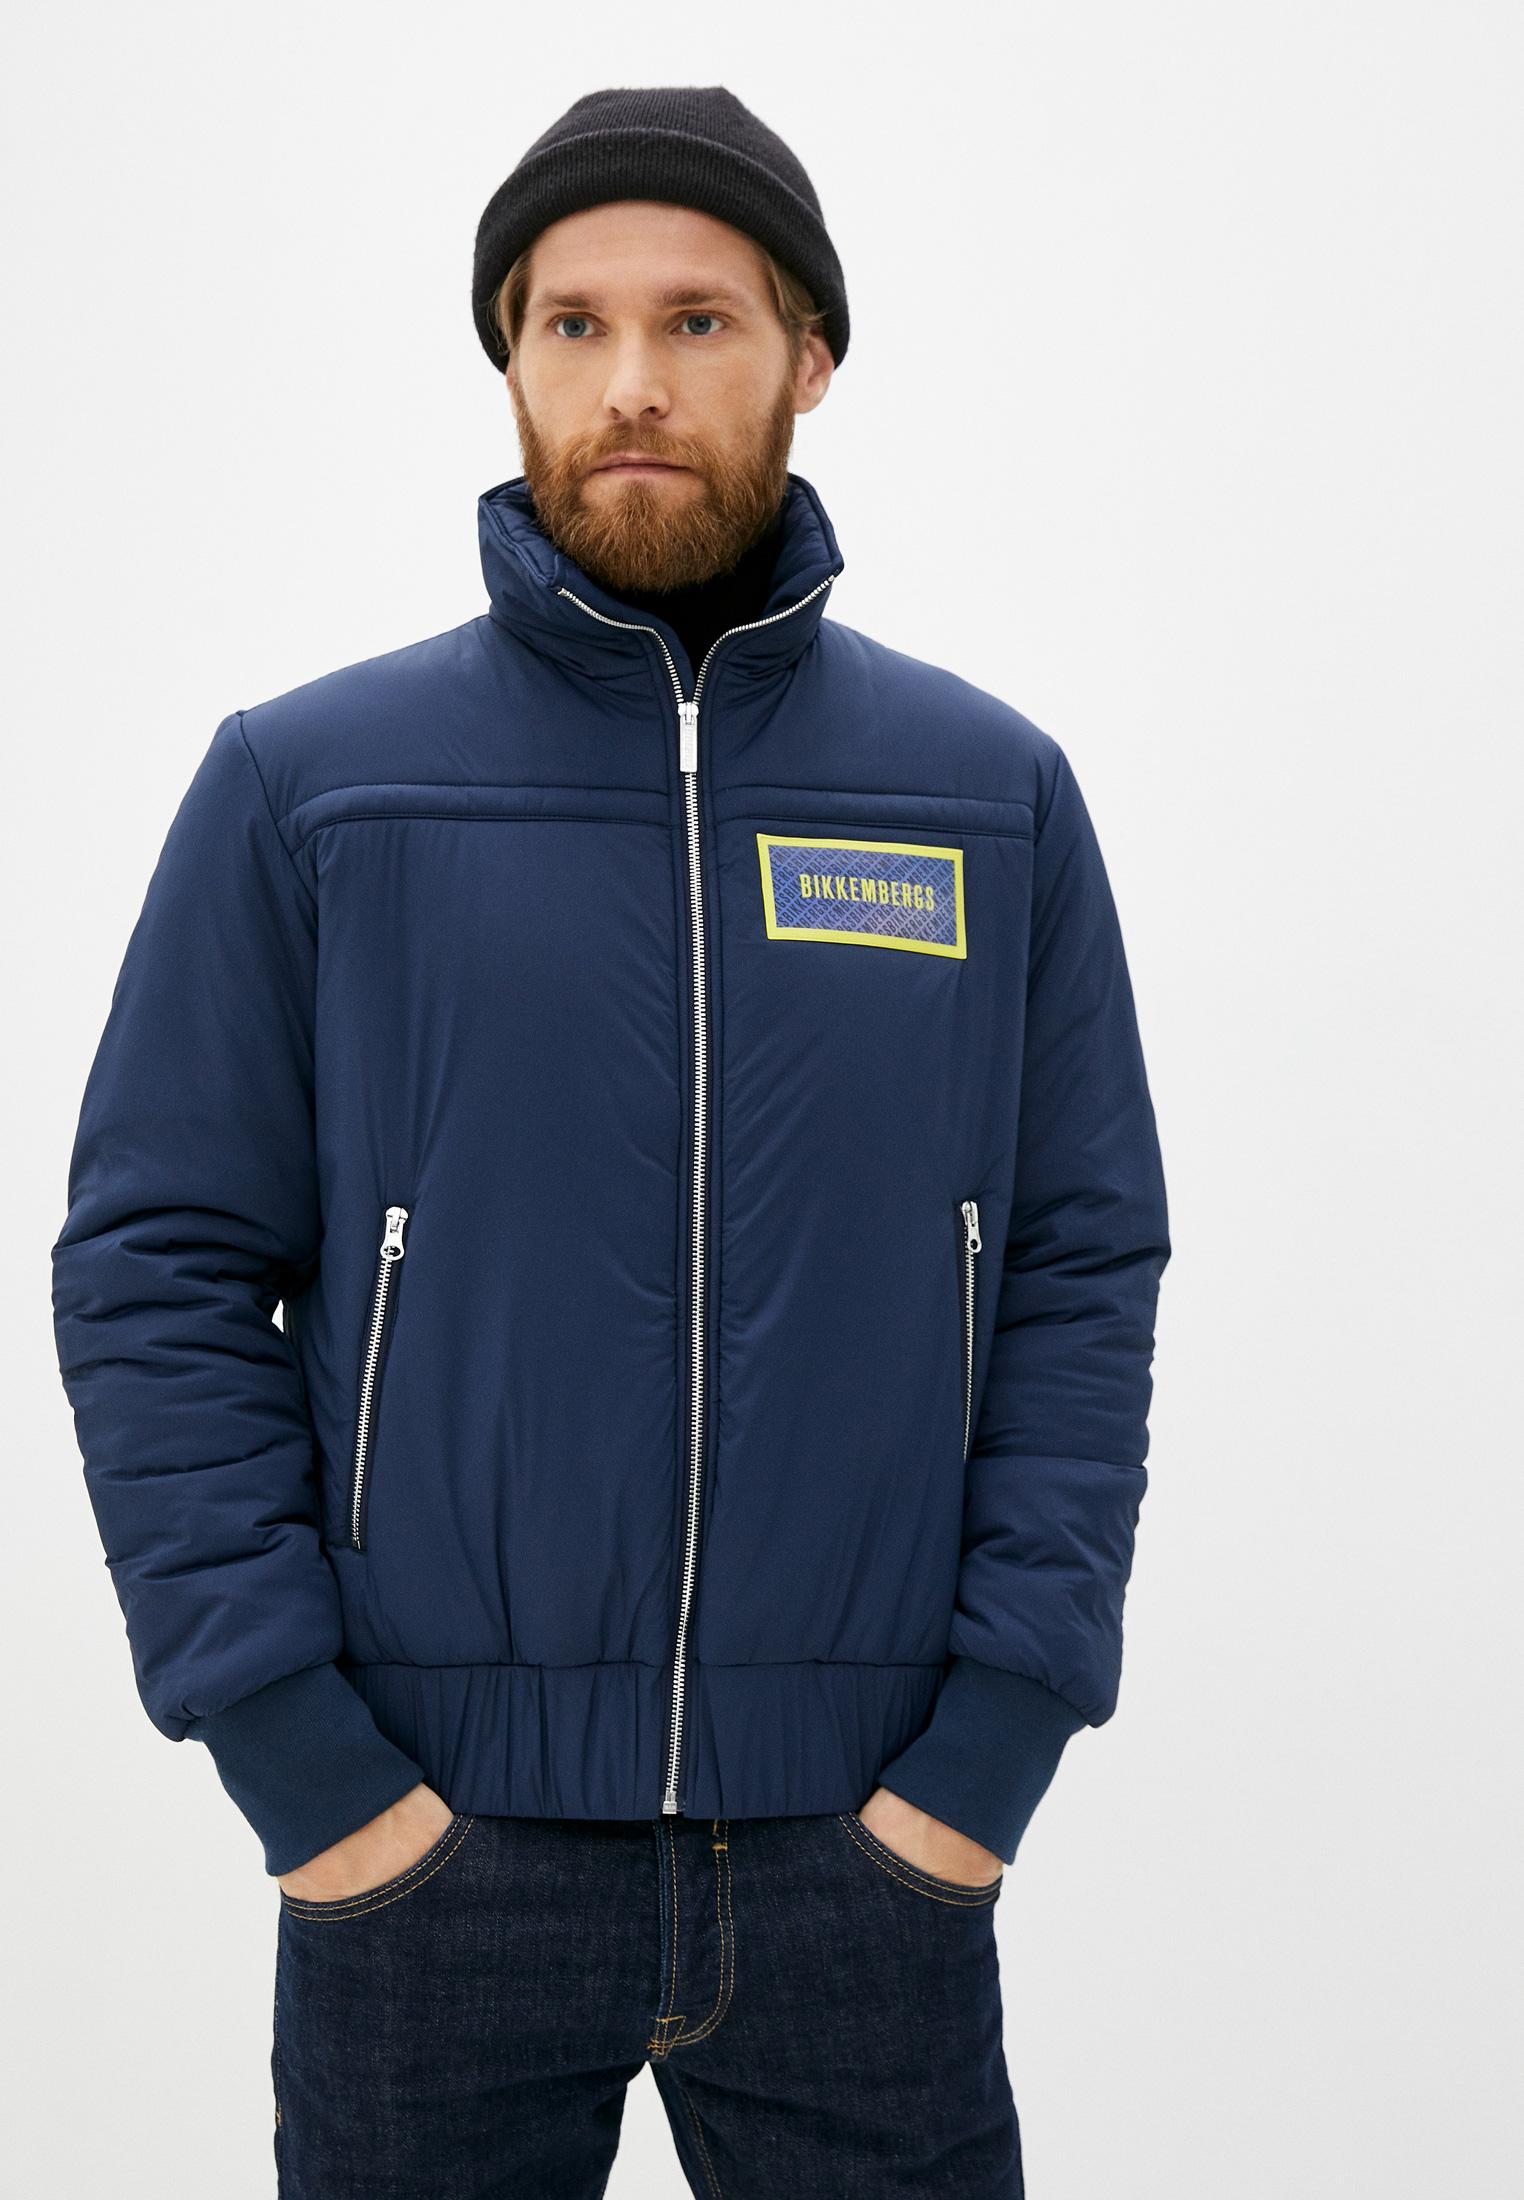 Мужская куртка Bikkembergs (Биккембергс) C H 130 00 S 3464